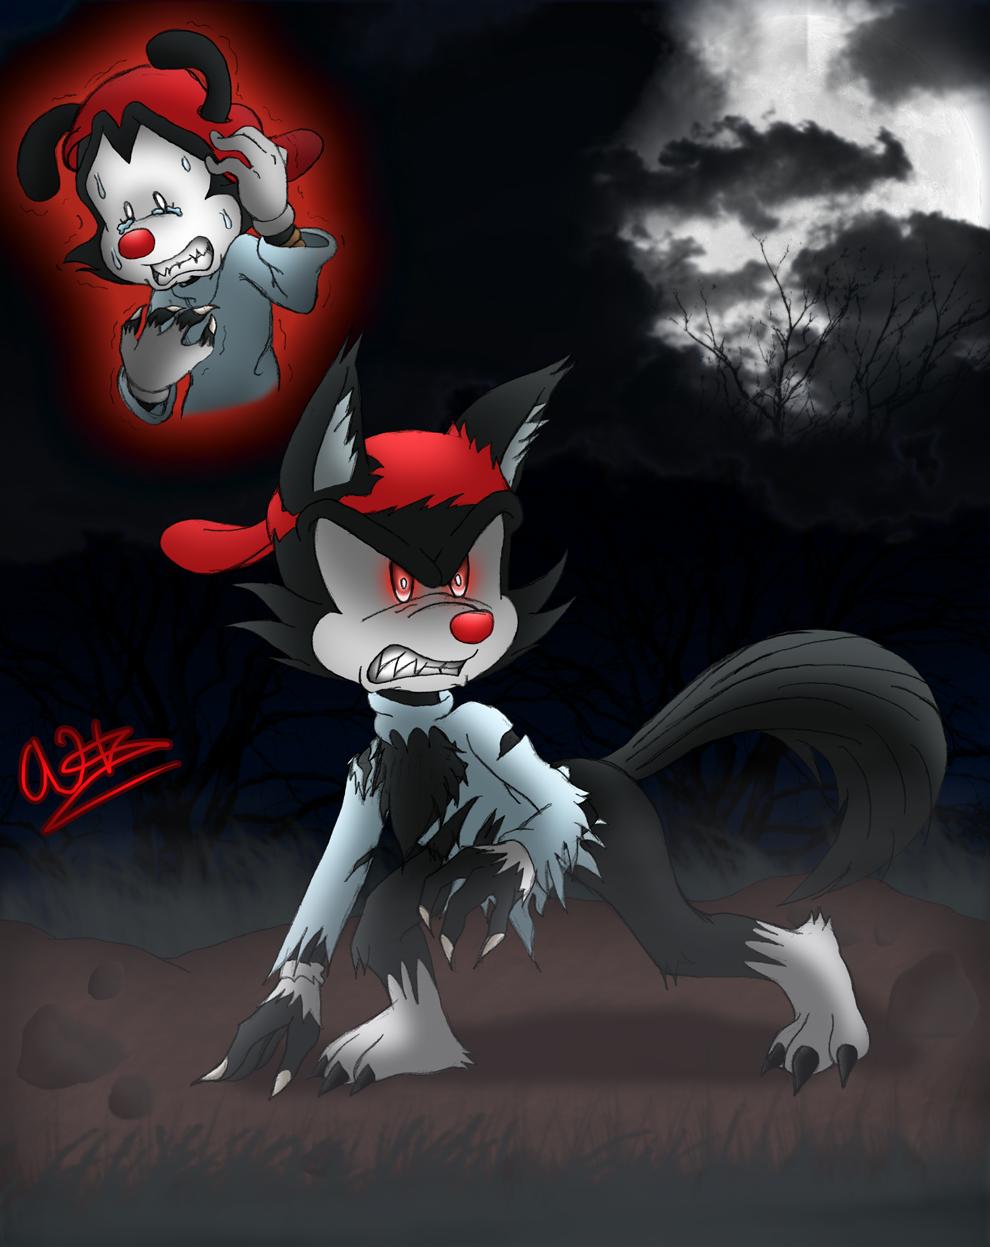 I Feel Like A Monster by SonicandShadowfan15 on DeviantArt